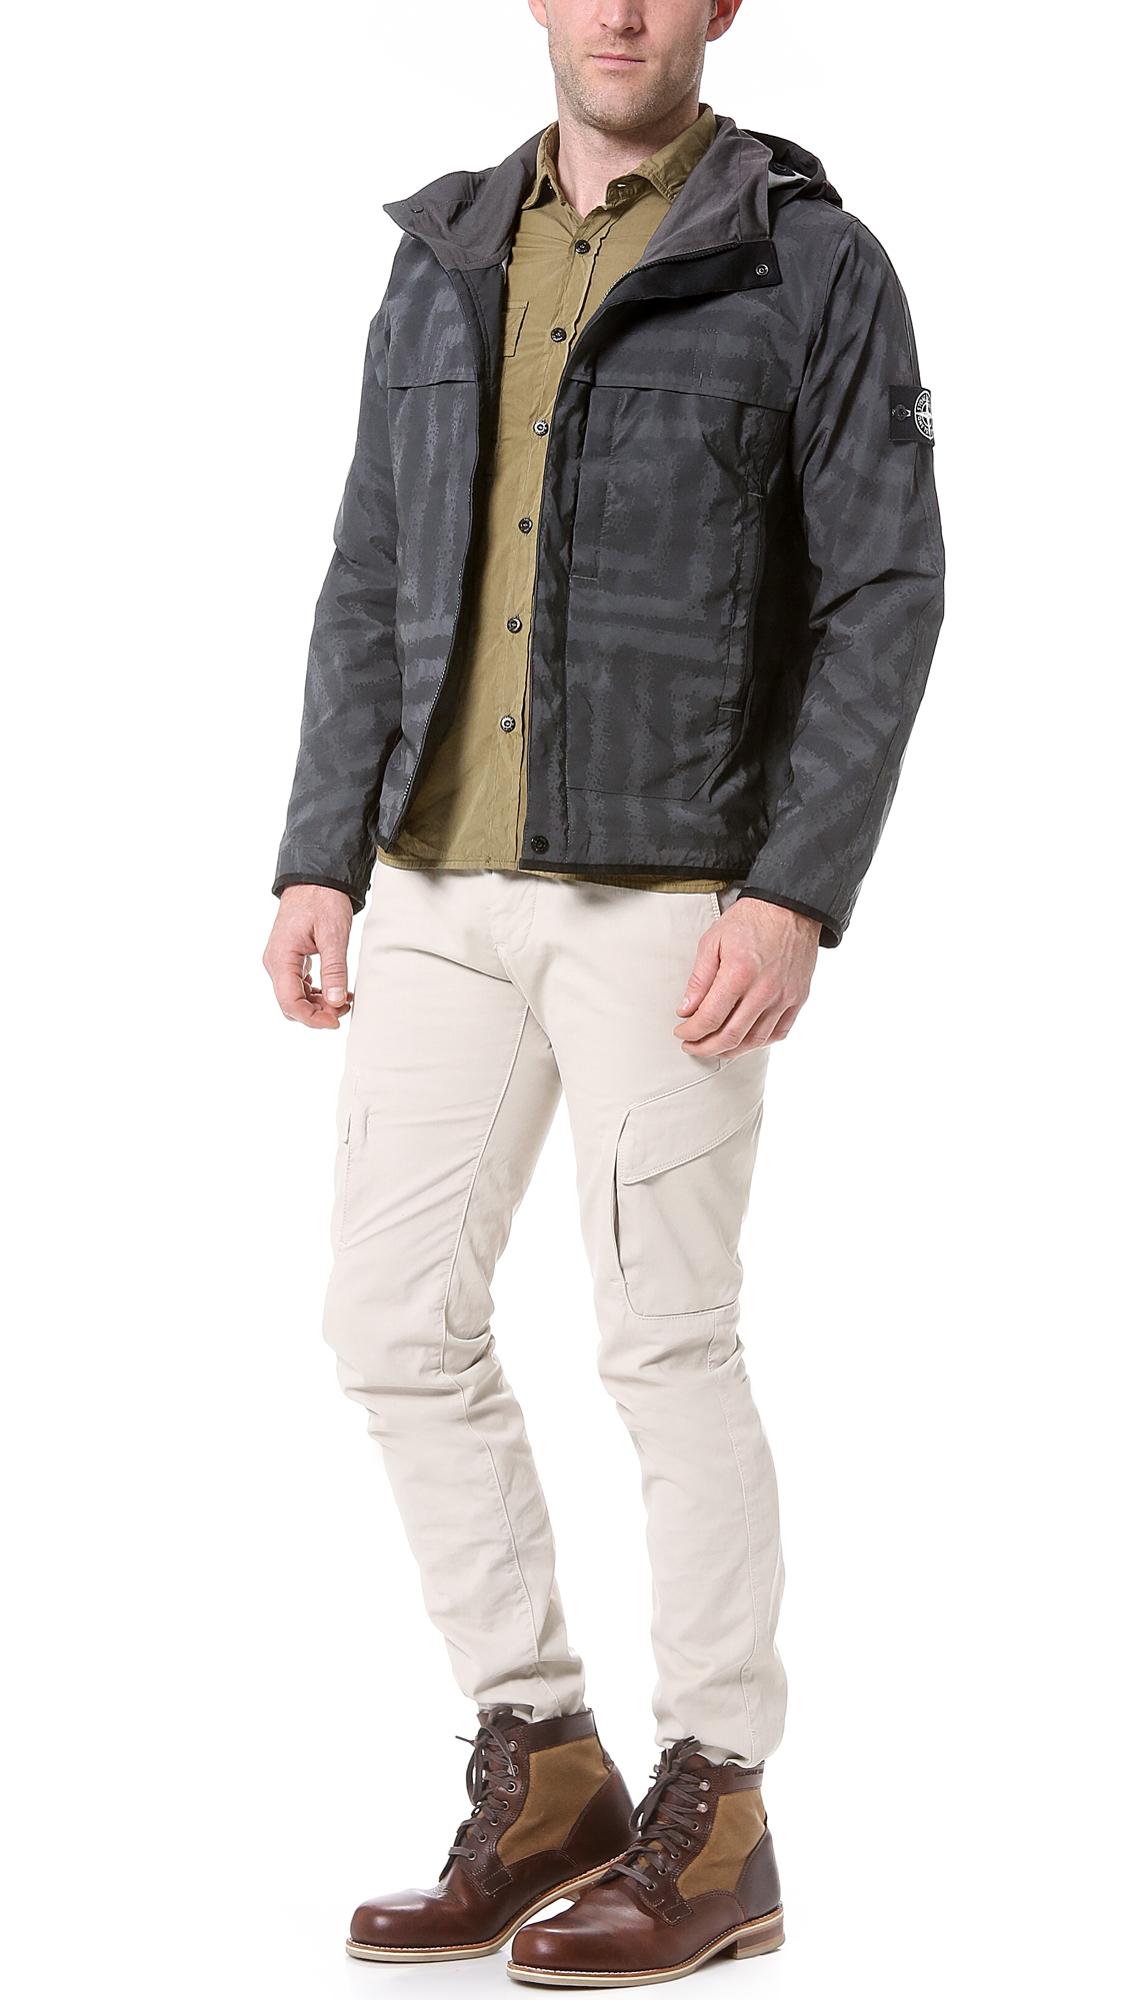 Stone Island Reflective Jacket With Lazer Treatment In